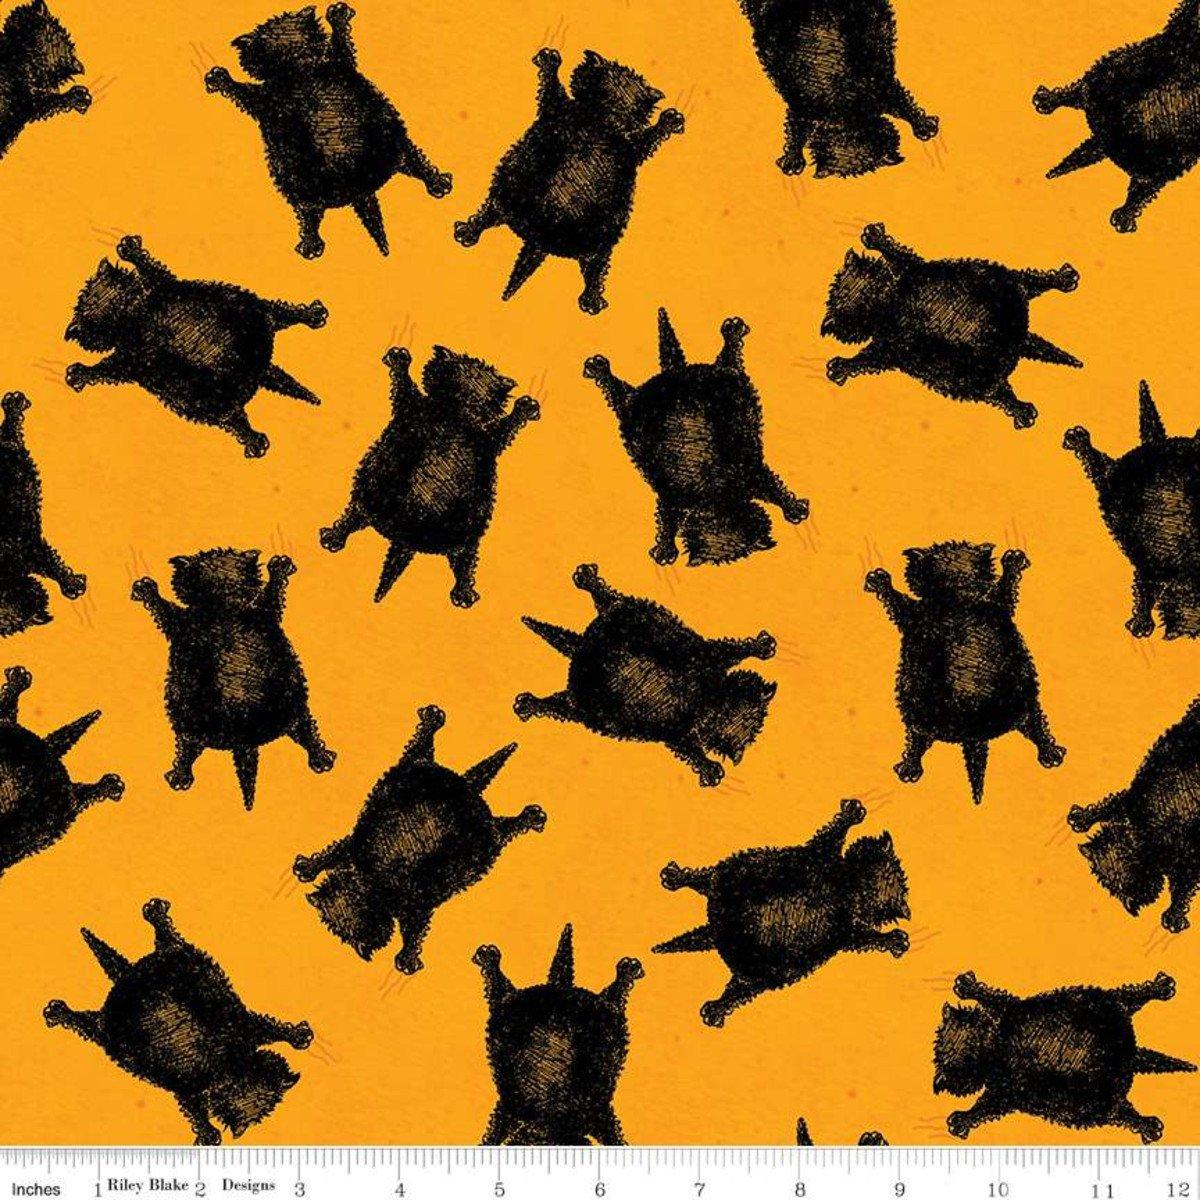 Orange - Scaredy Cats Toss - Goose Tales - C9398-ORANGE